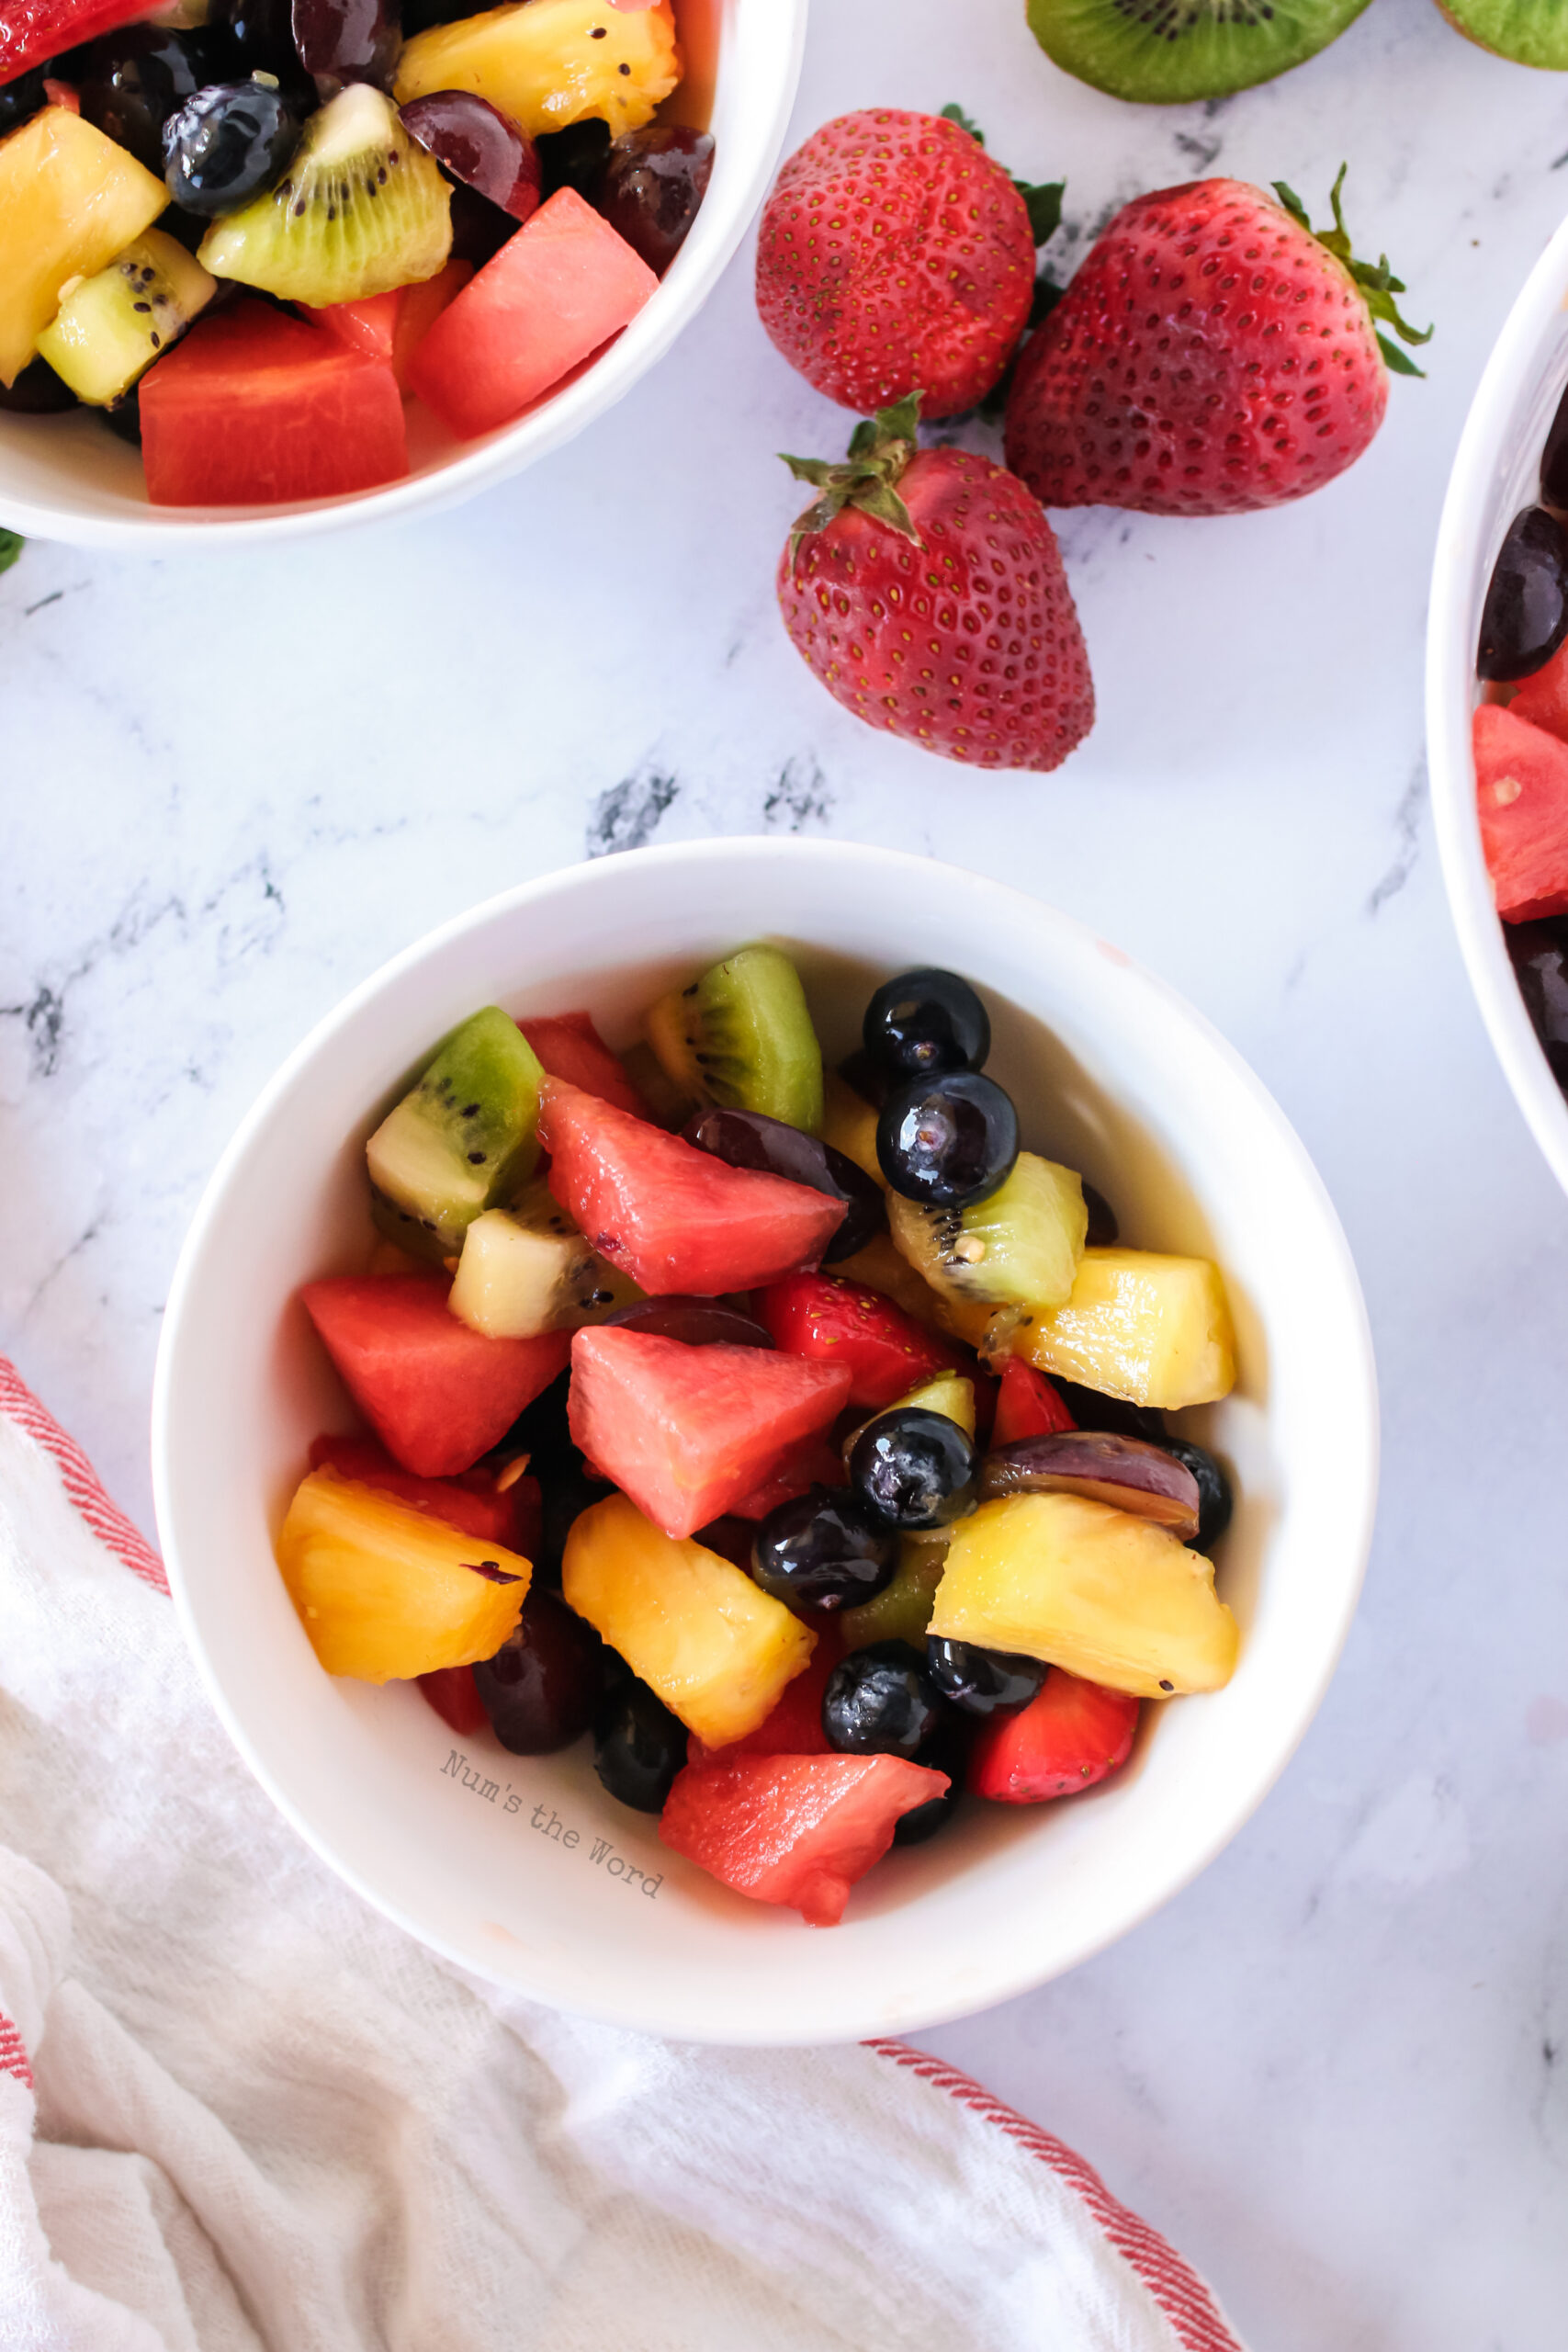 single bowl of fruit salad to enjoy